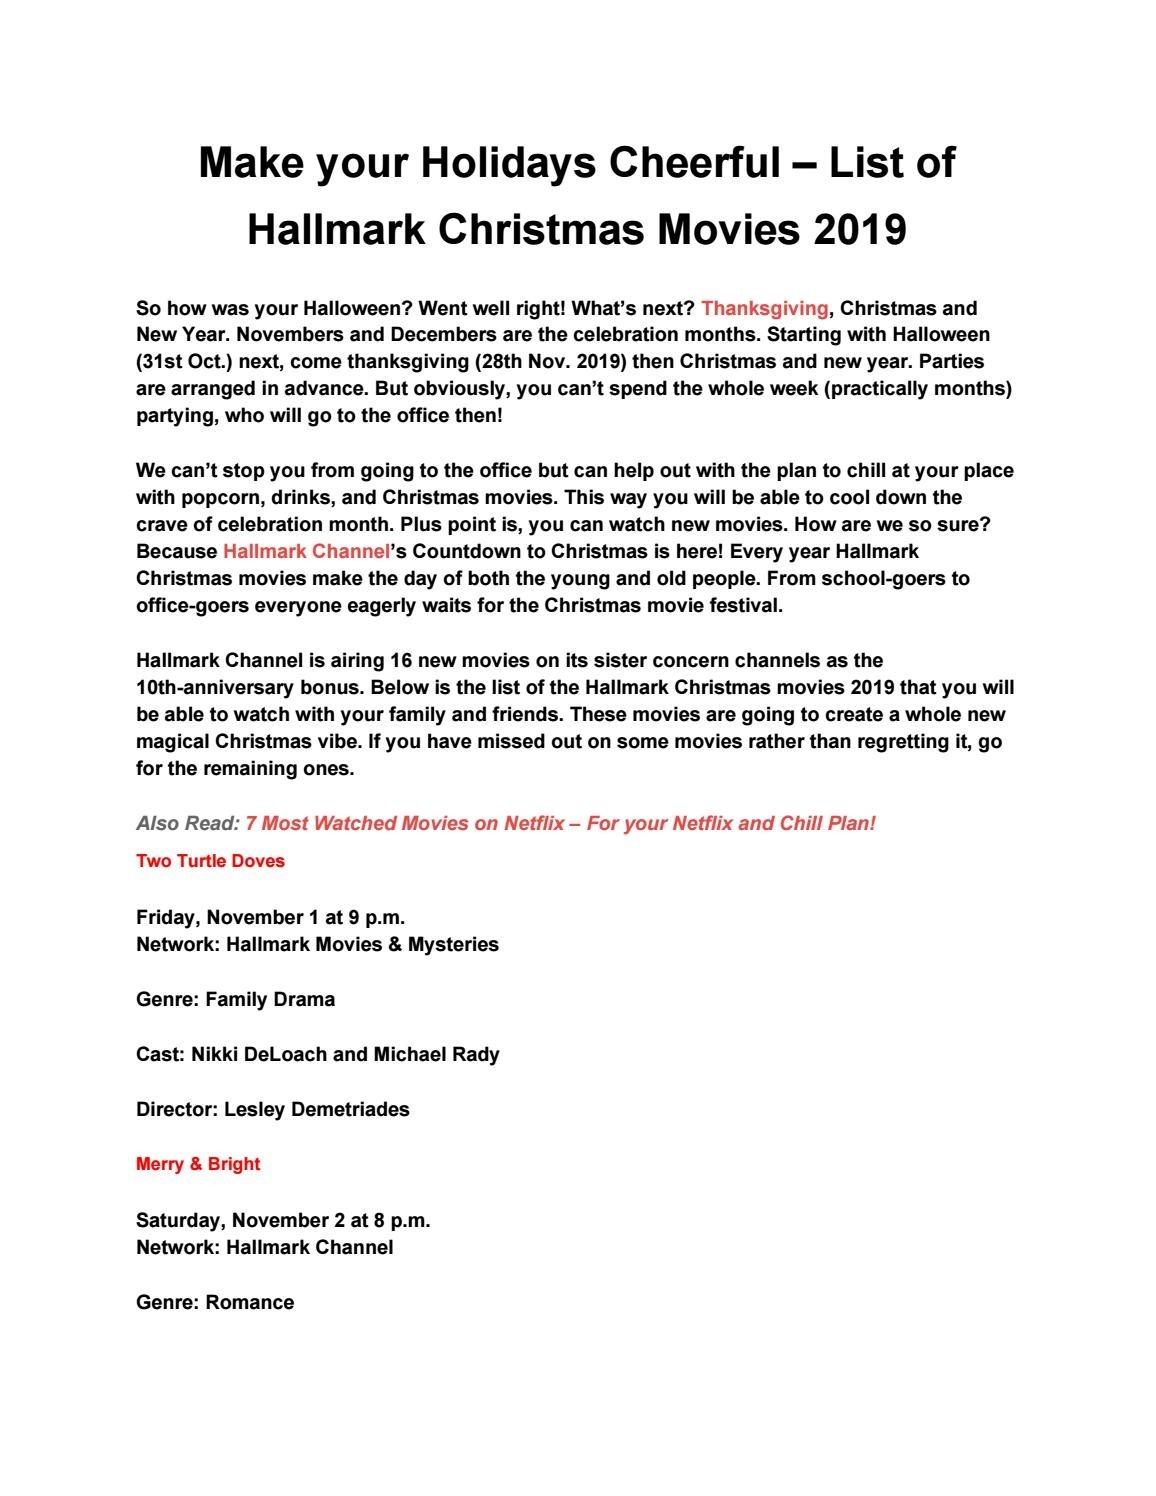 Make Your Holidays Cheerful – List Of Hallmark Christmas-What Are Hallmark Holidays